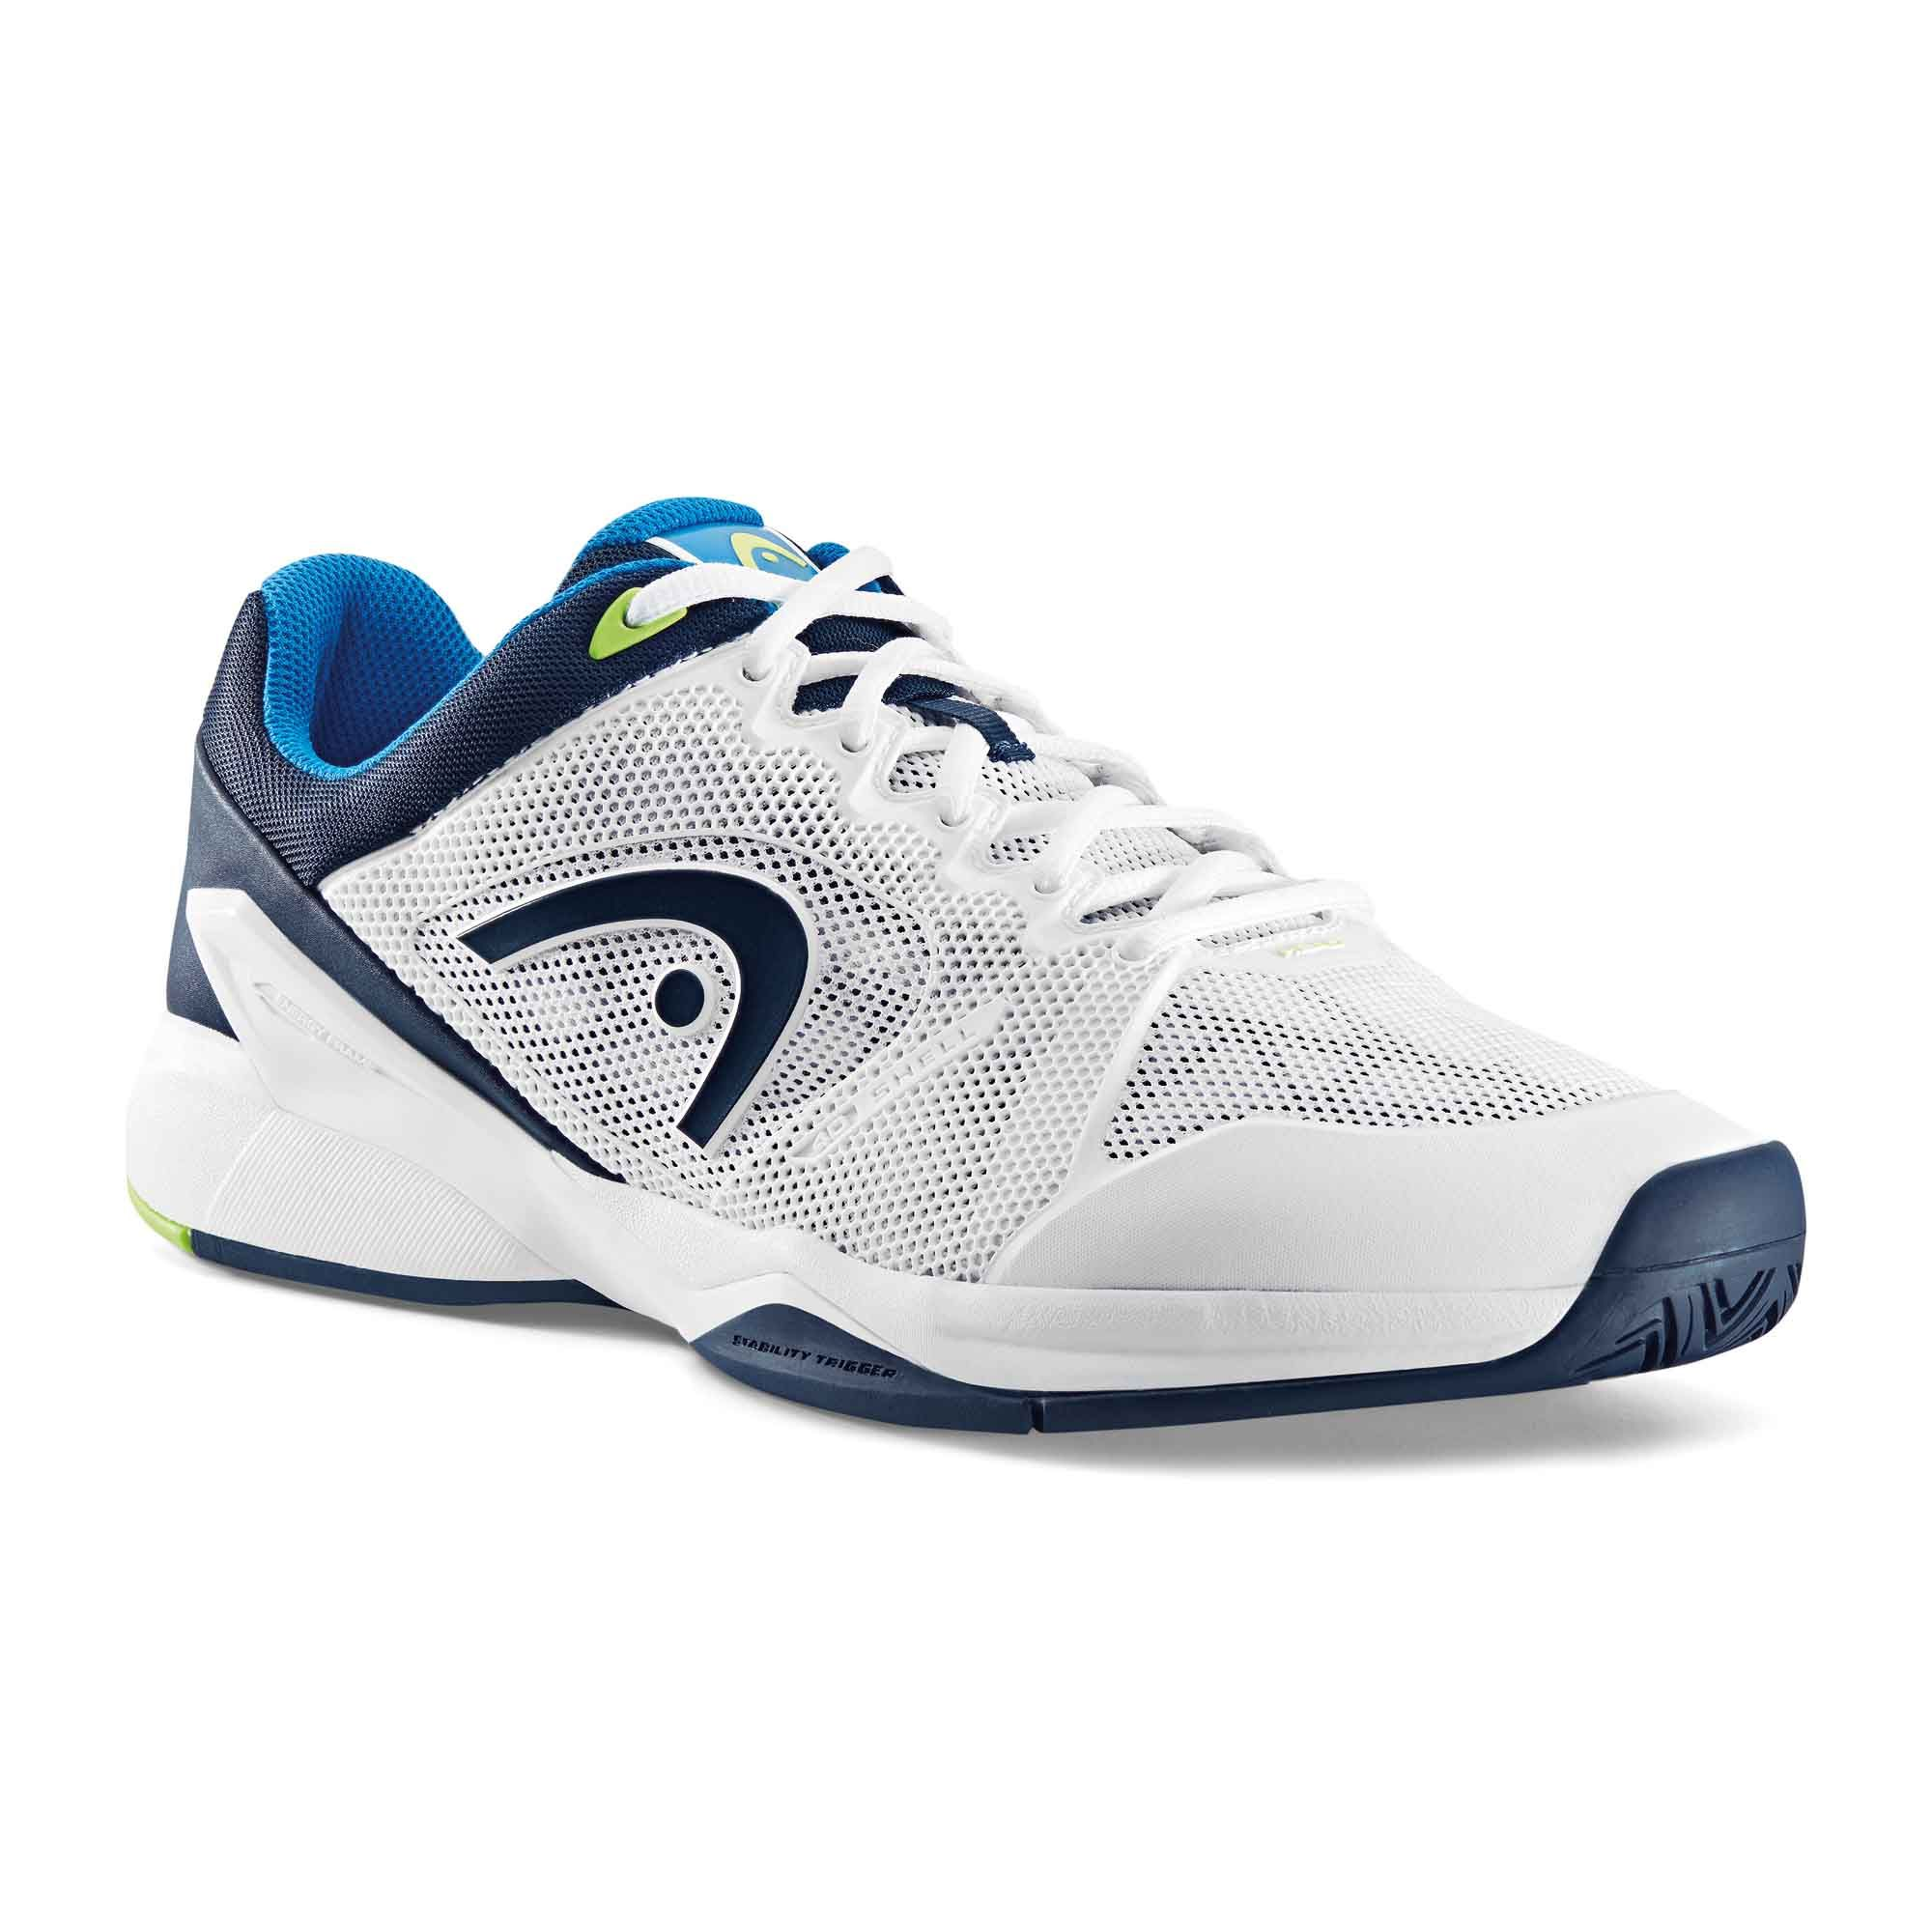 Best Tennis Shoes For Squash